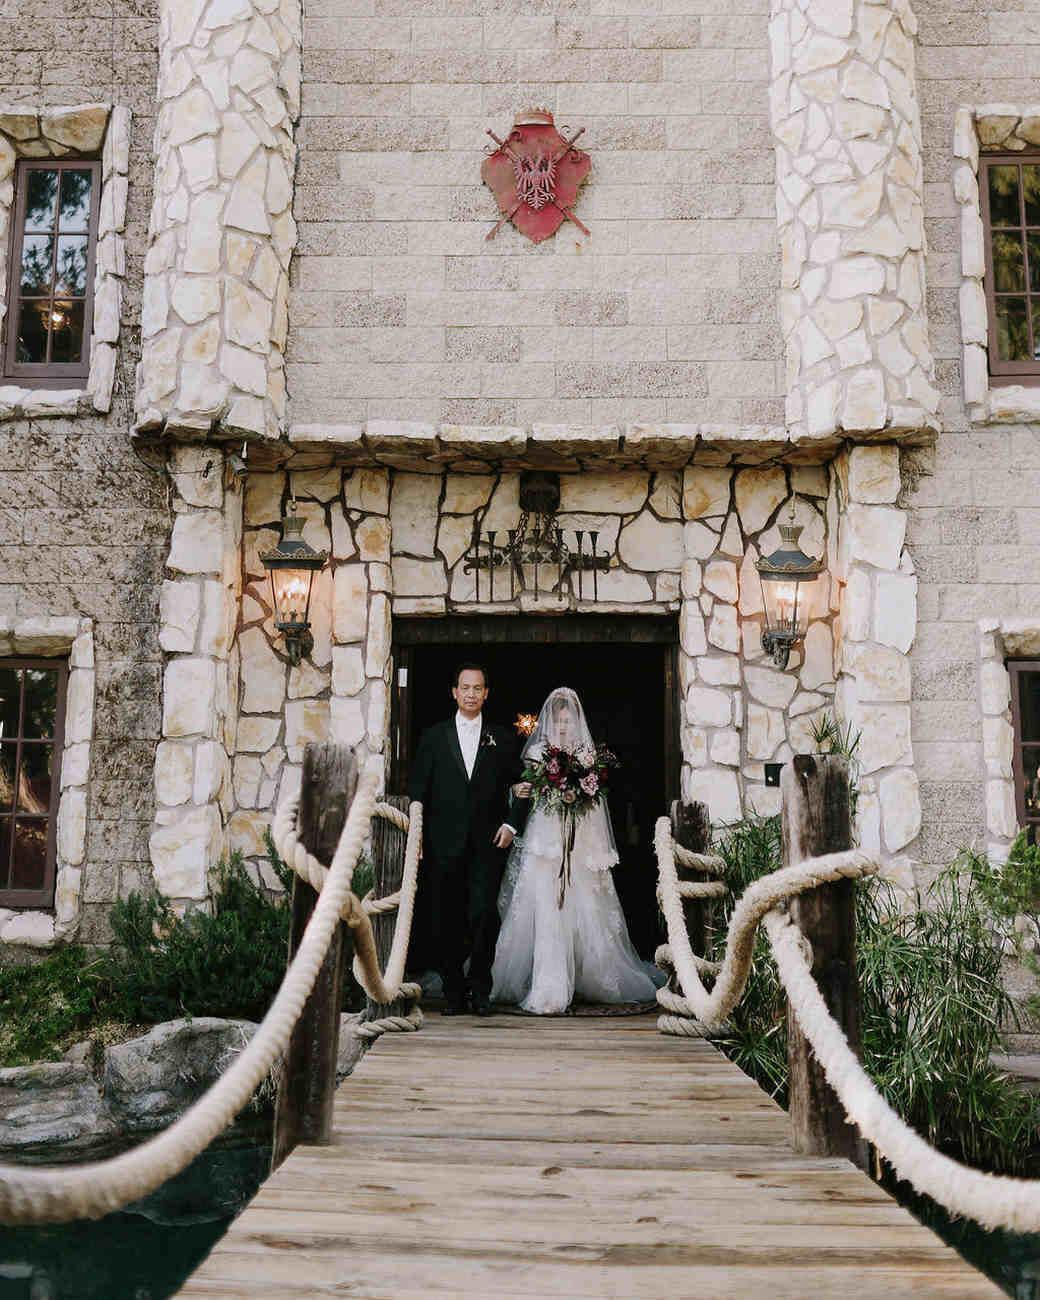 Harry Potter-Themed Wedding 6 (1)